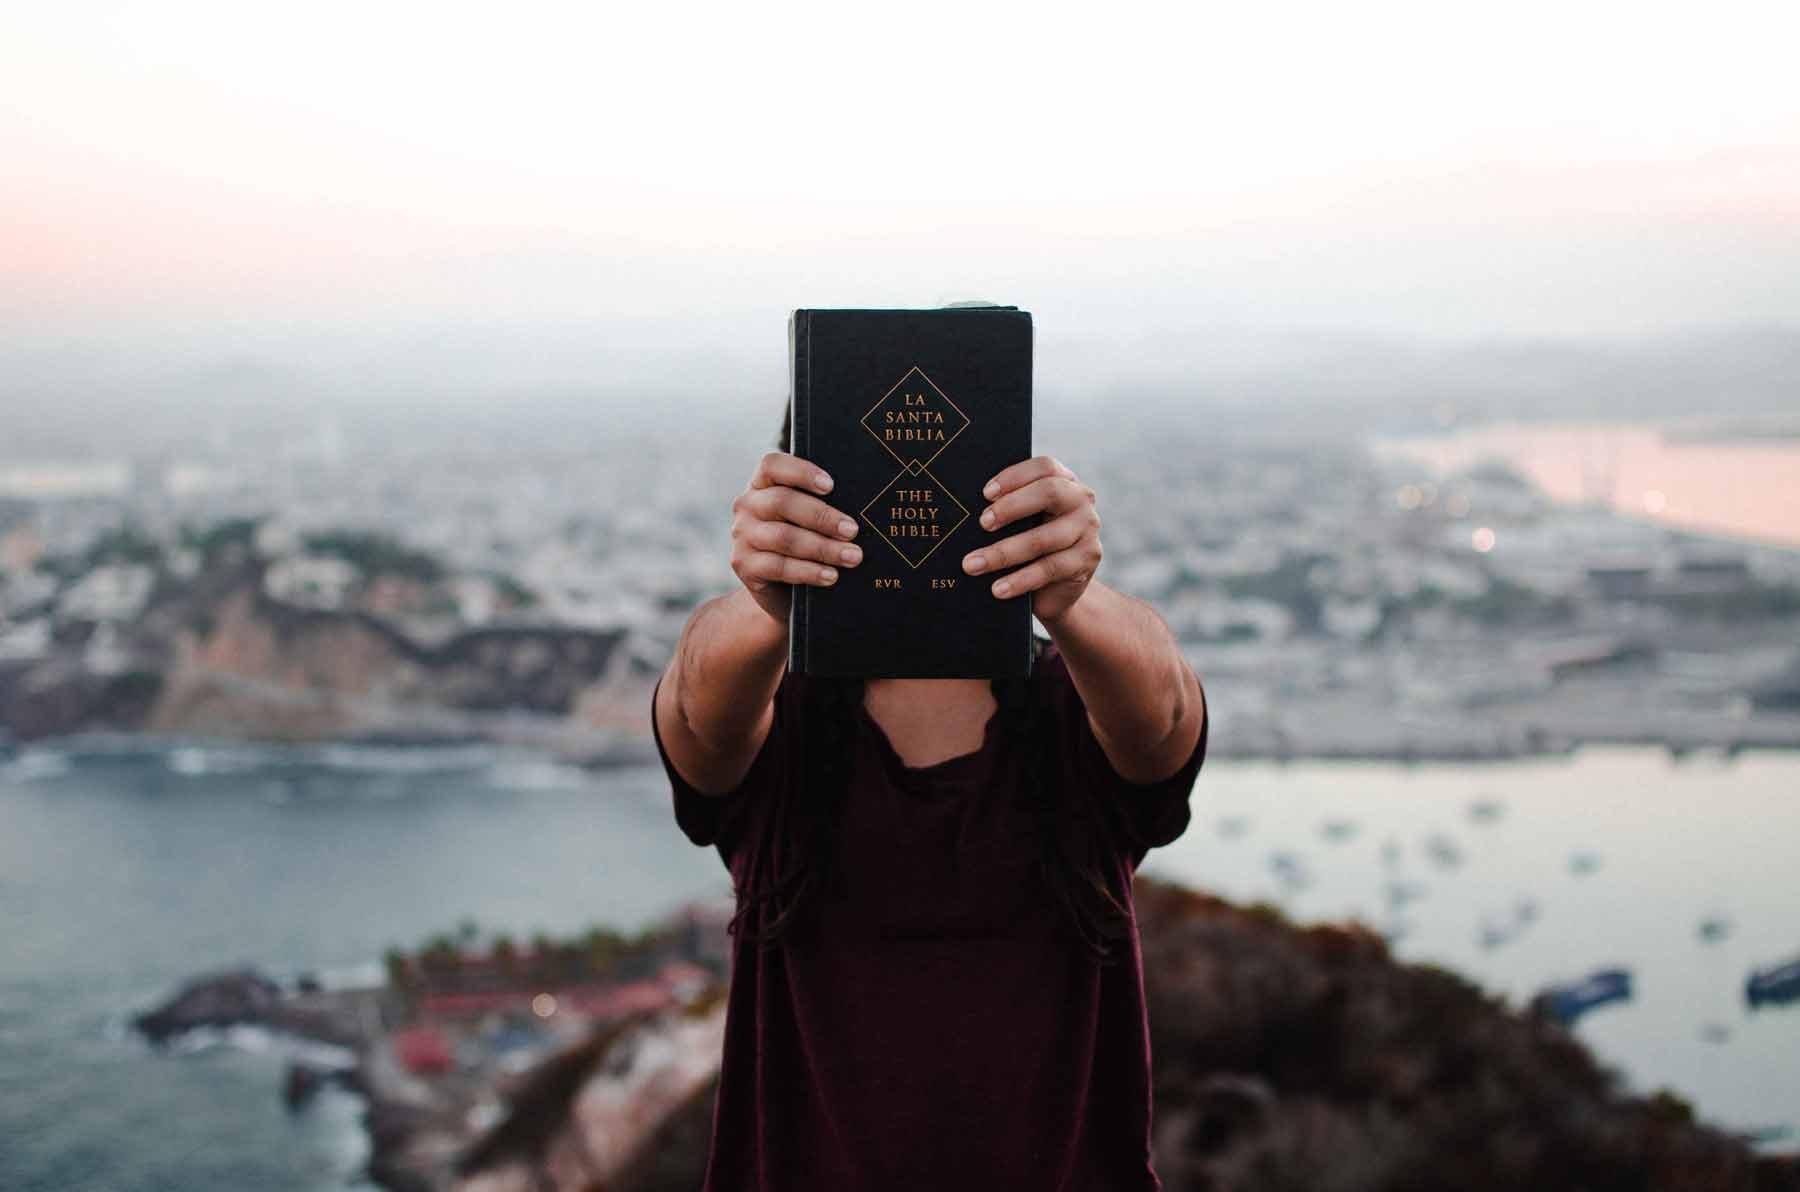 YWAM Bible holding Adventure